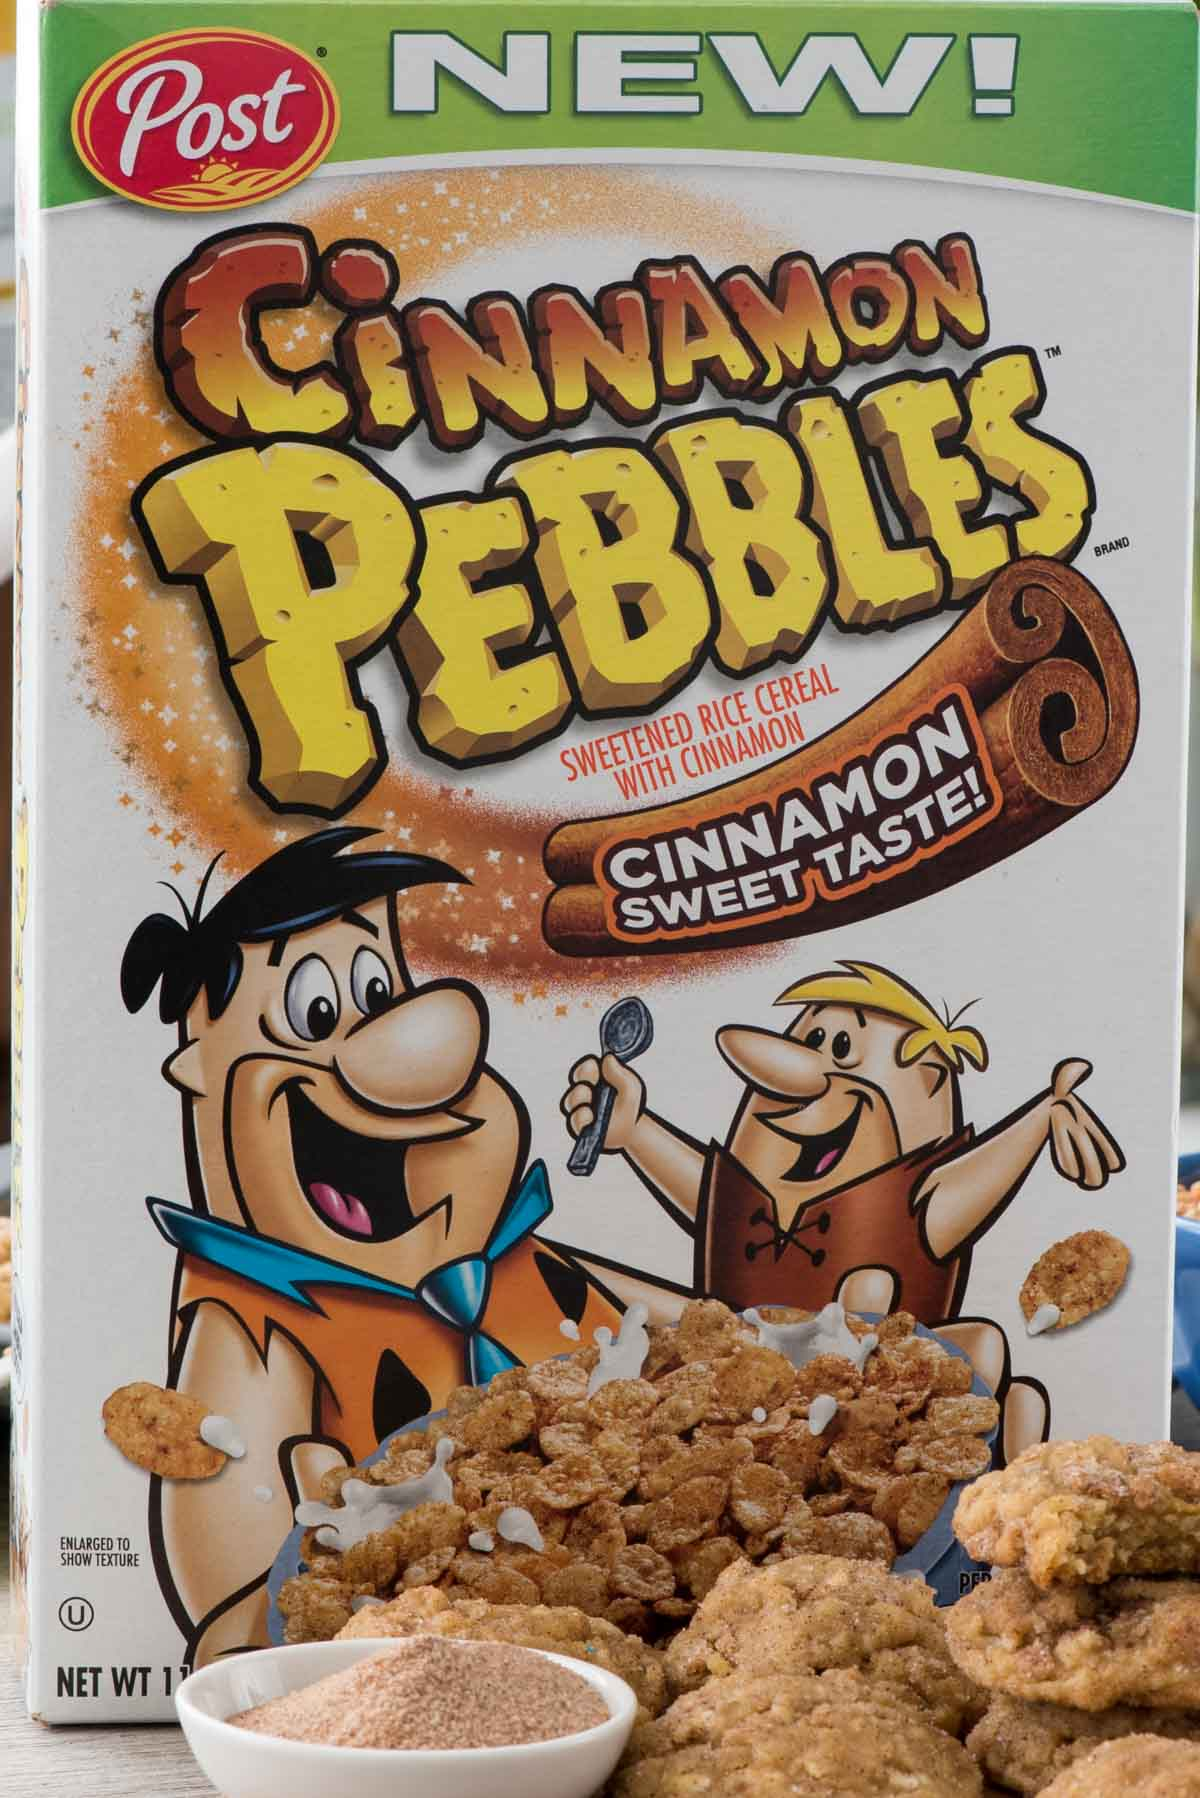 NEW Cinnamon Pebbles cereal